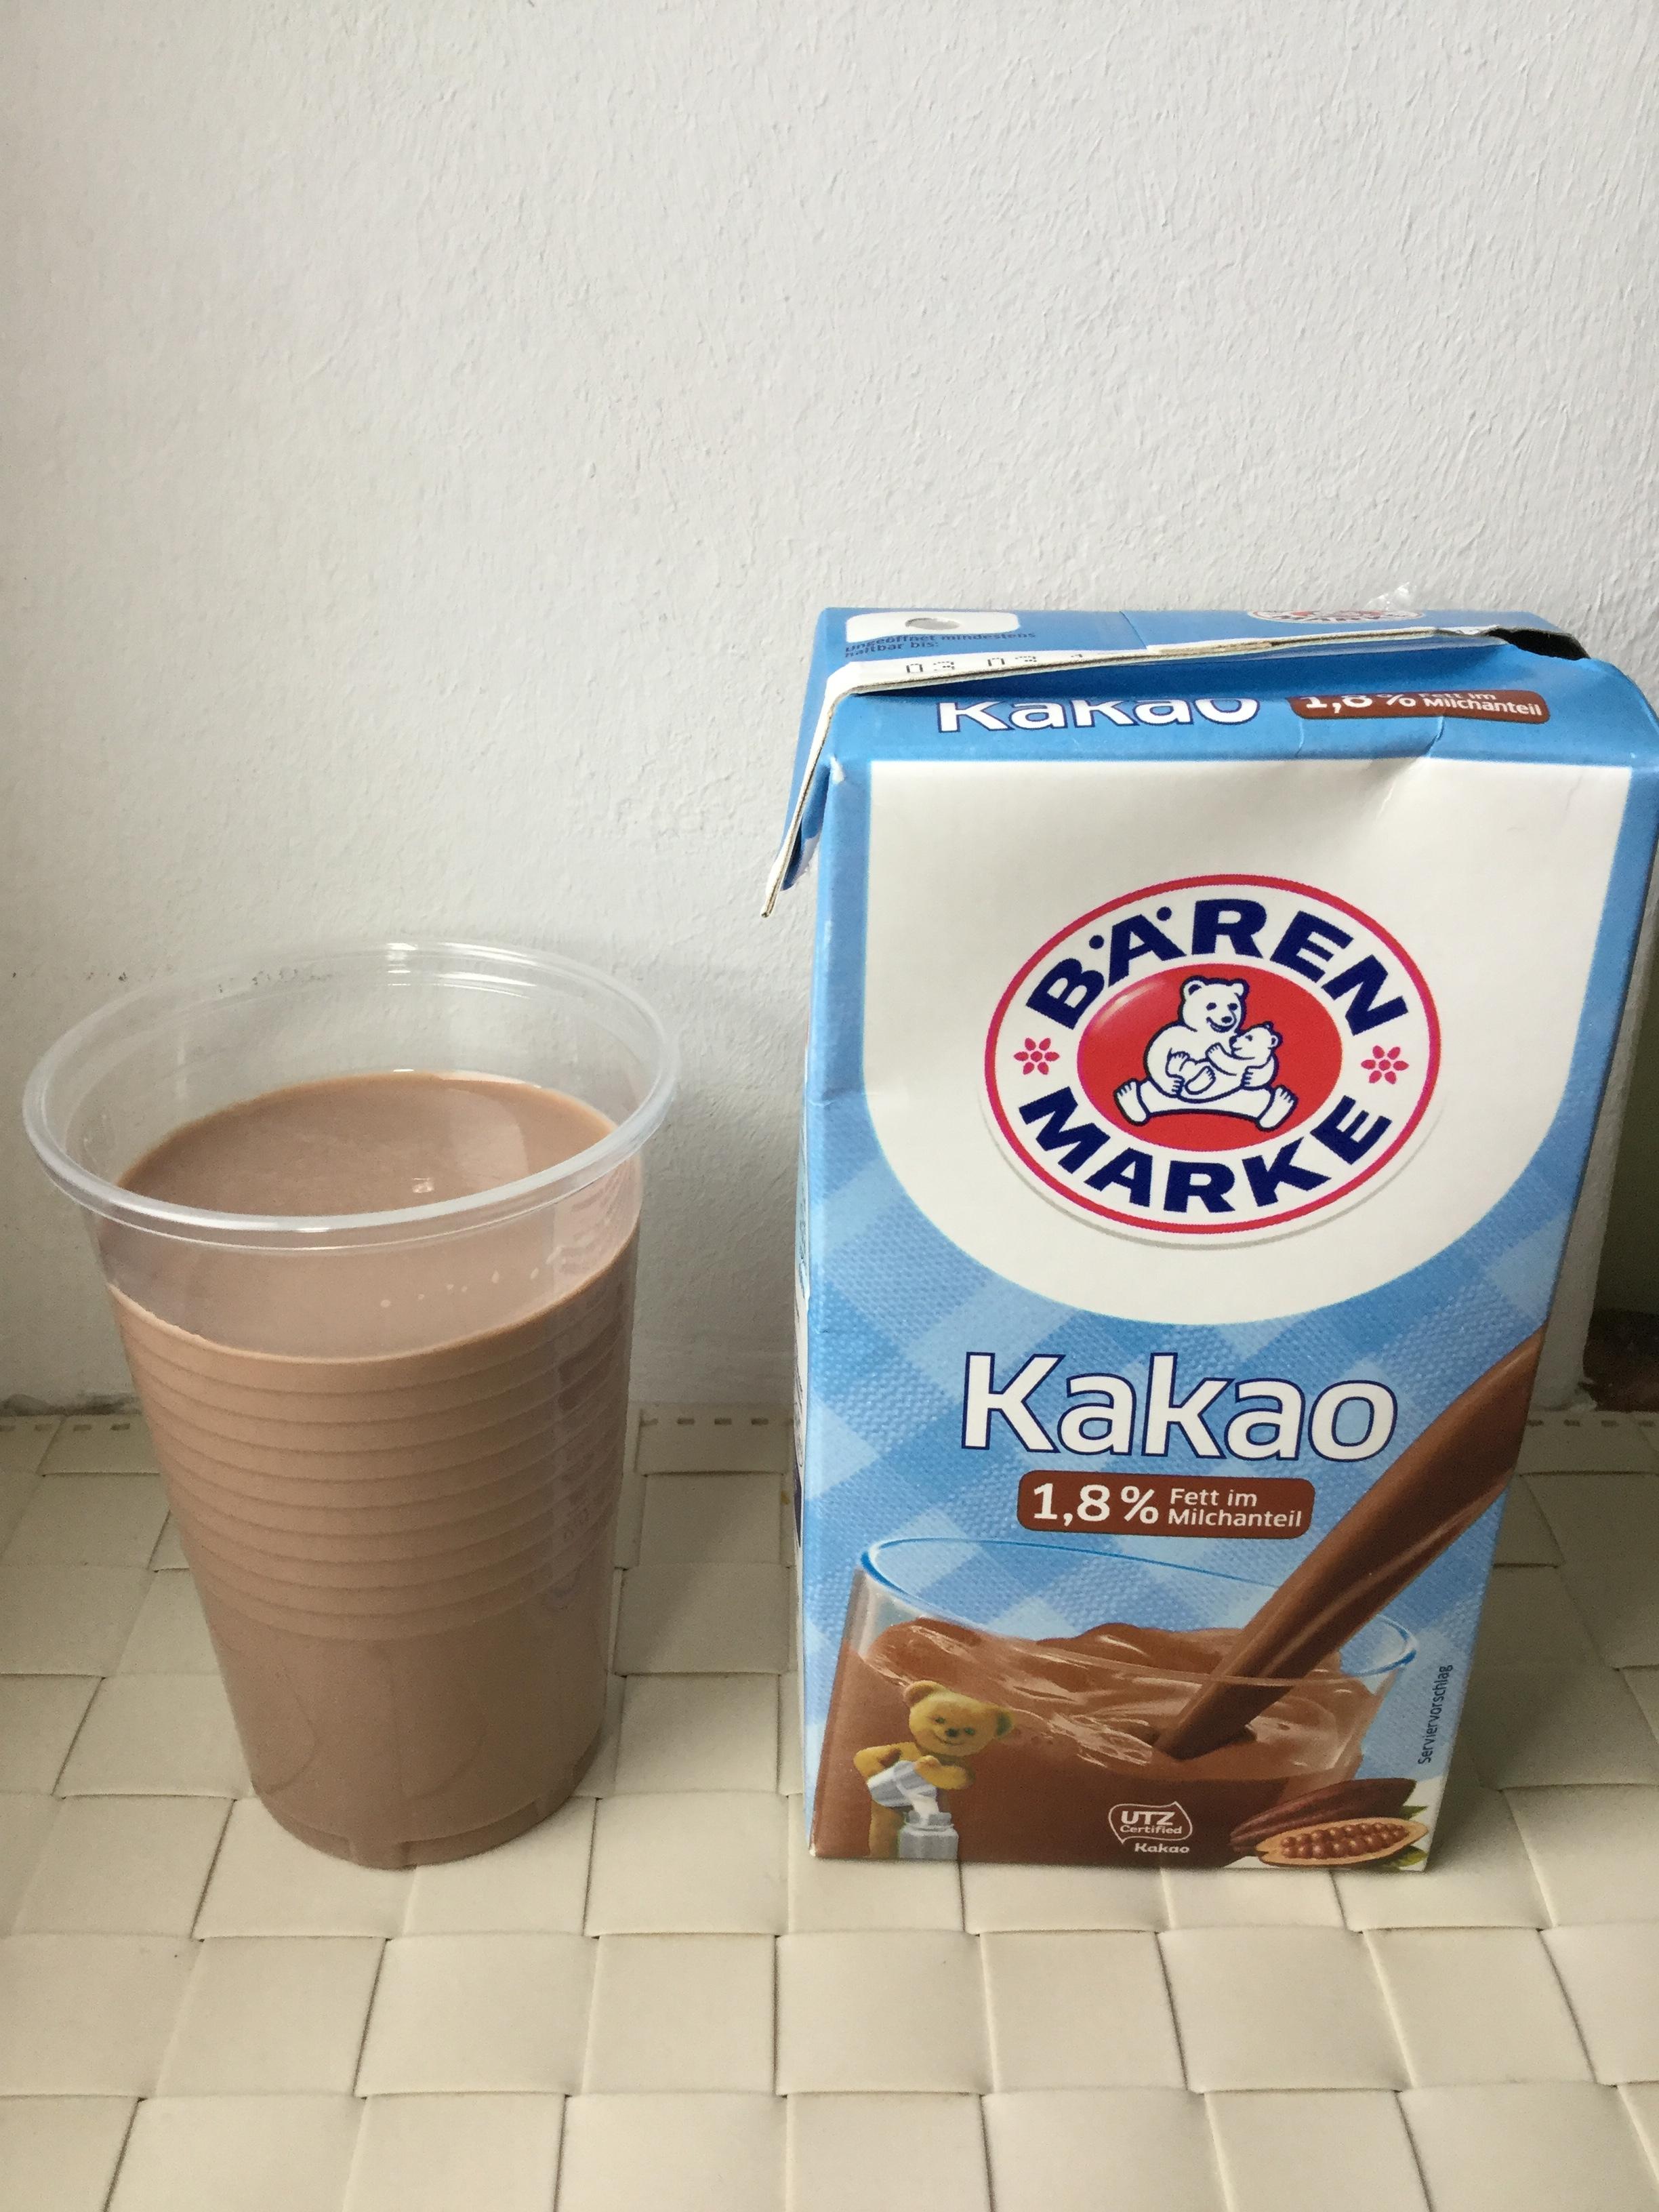 Baren Marke Kakao (1.8%) UHT Cup